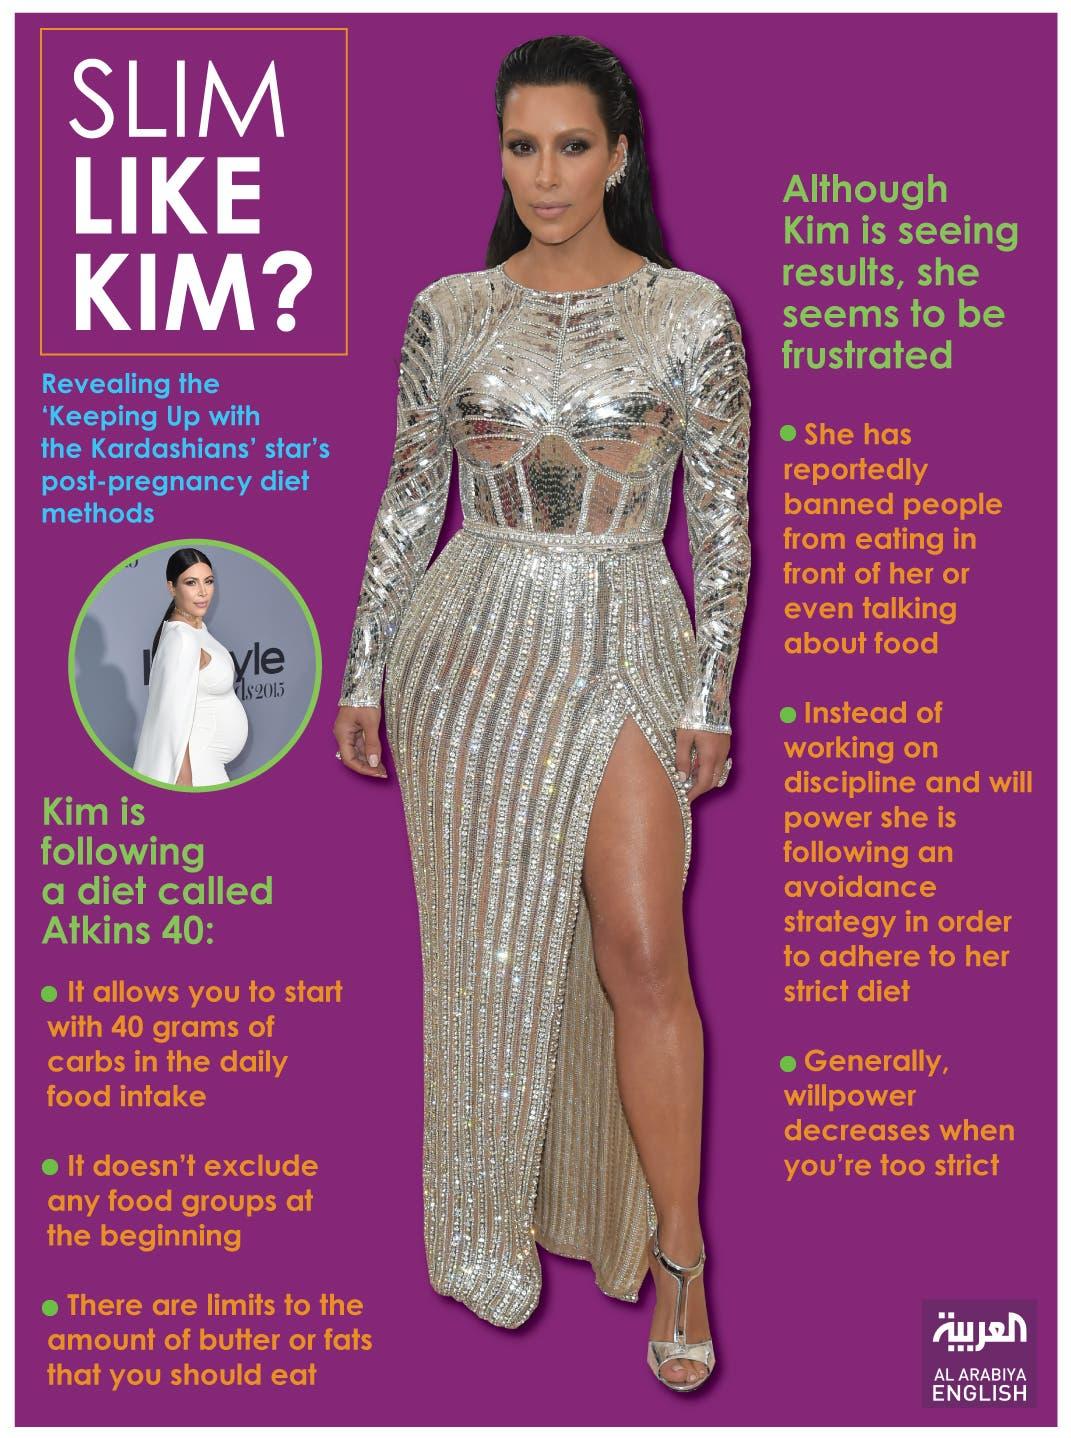 Infographic: Slim like Kim?